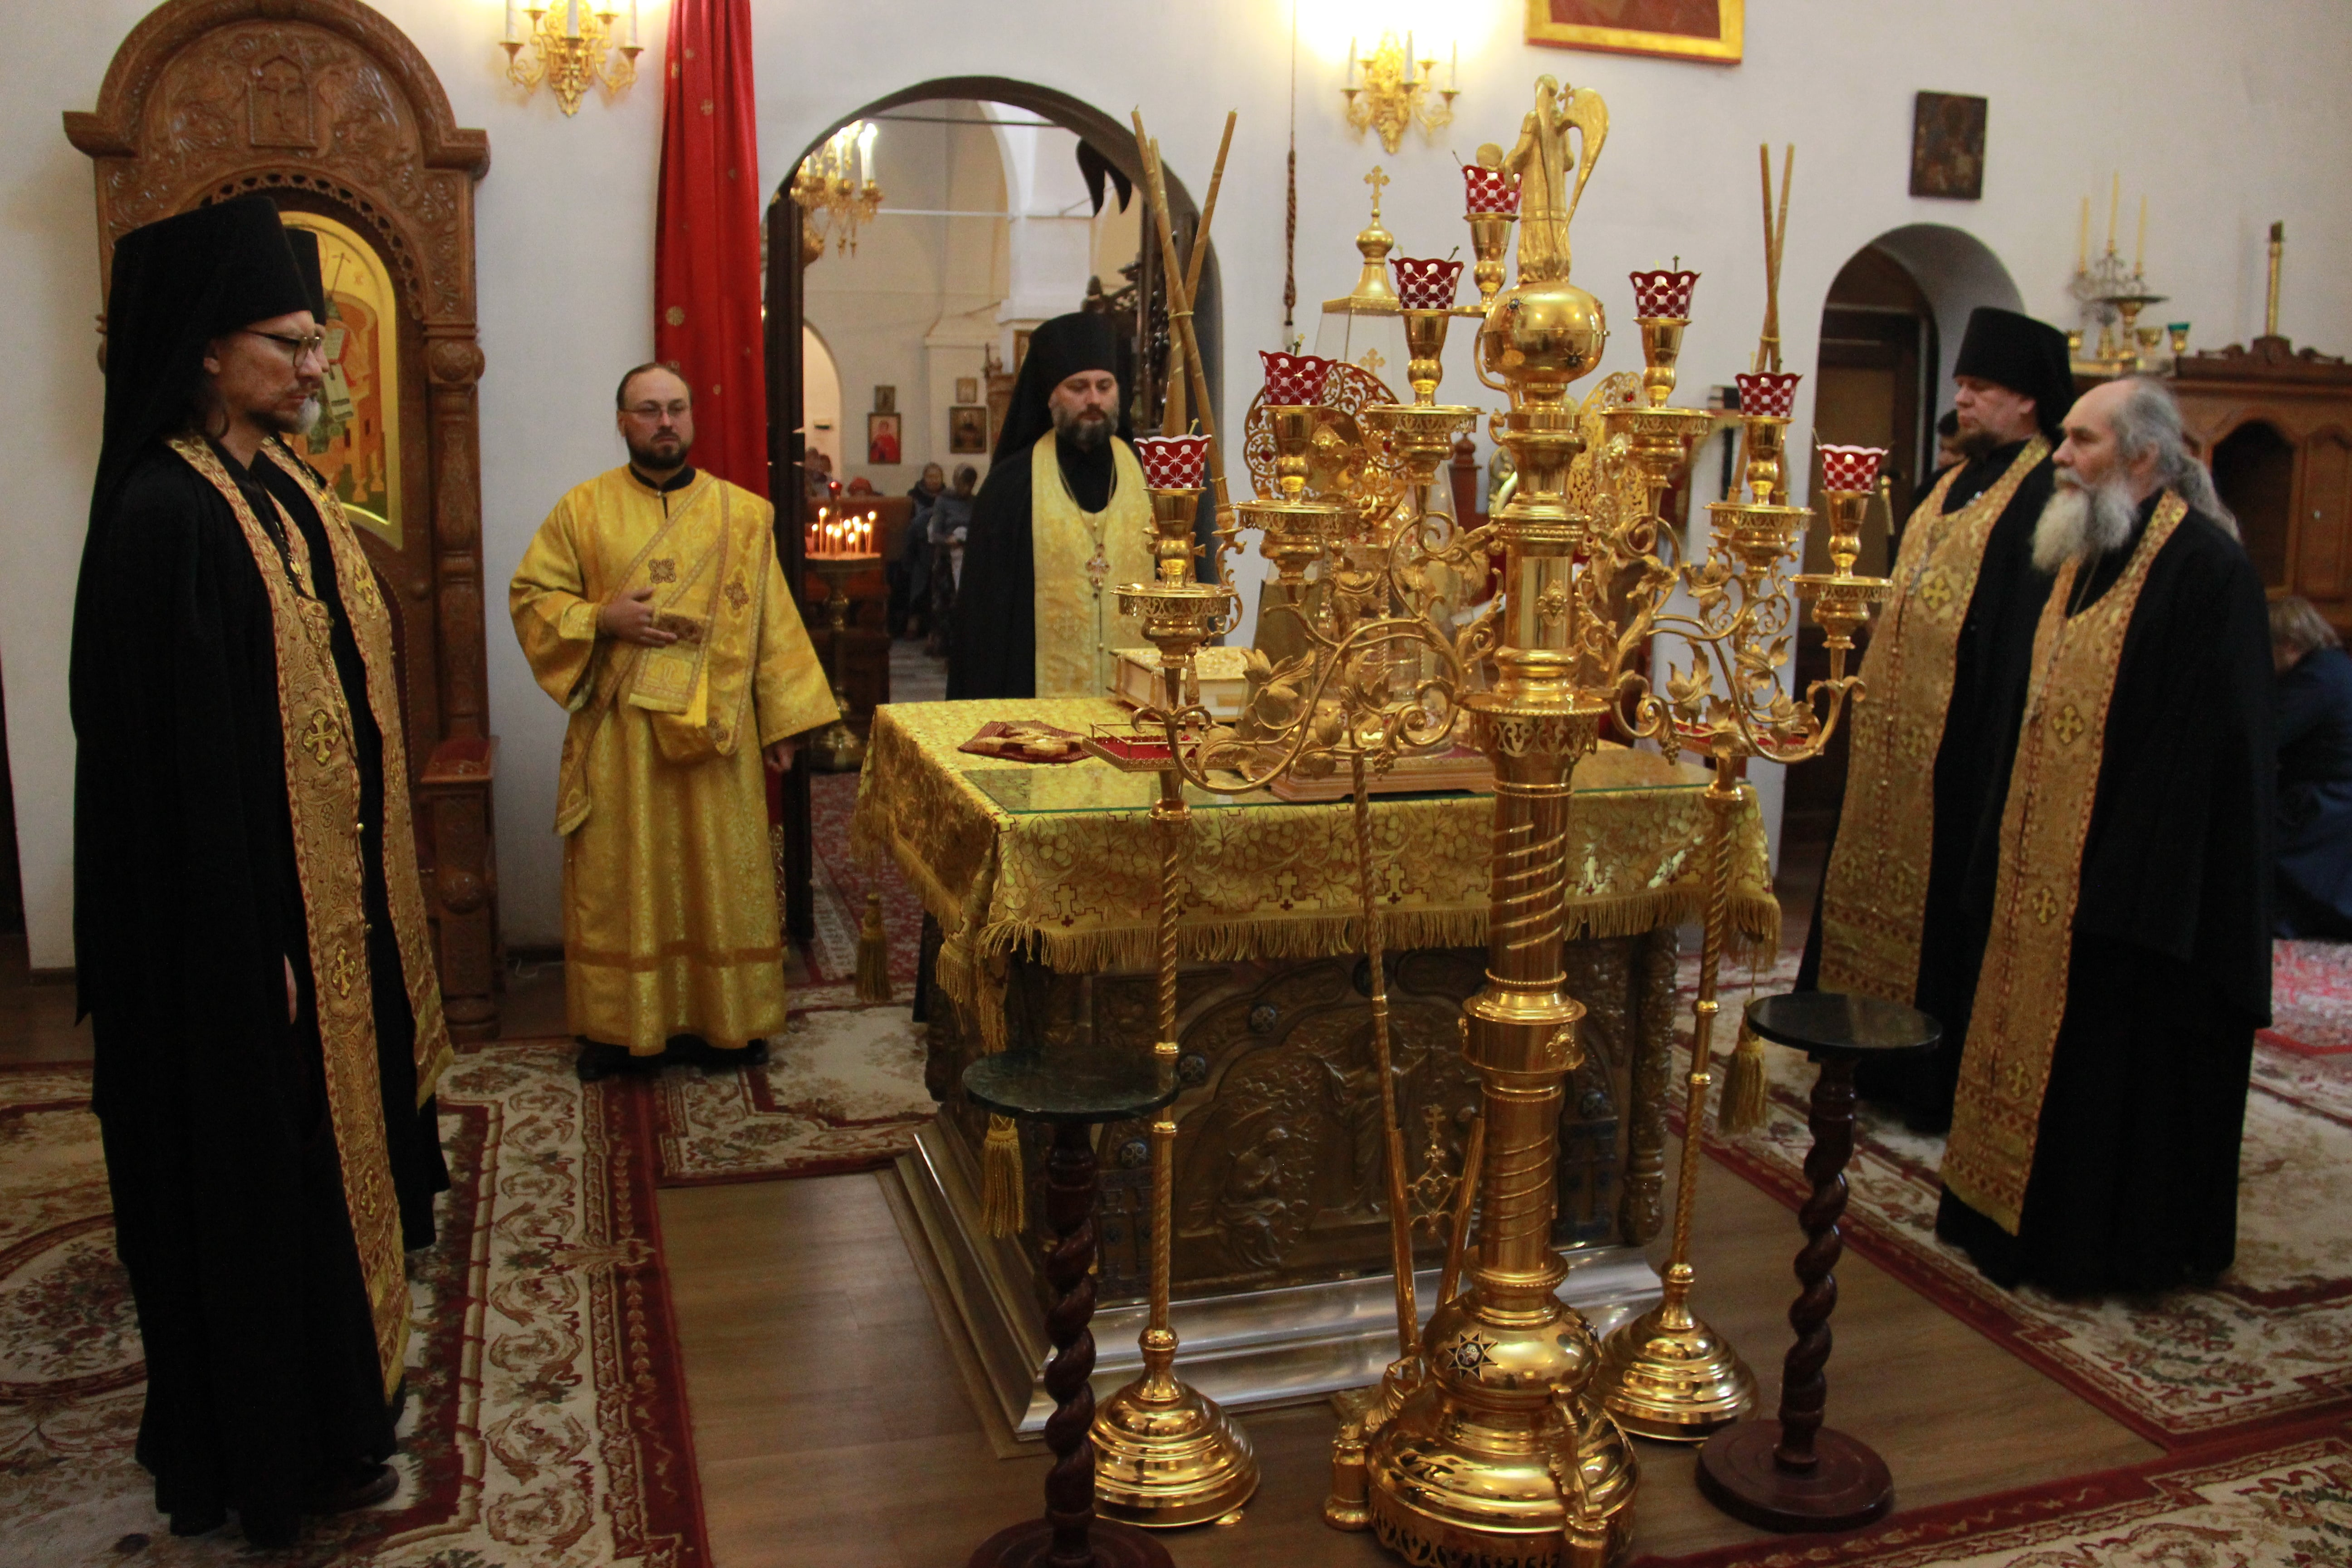 http://monuspen.ru/photoreports/4496b50e84751dce2e2b0d8a6638fb3j.JPG